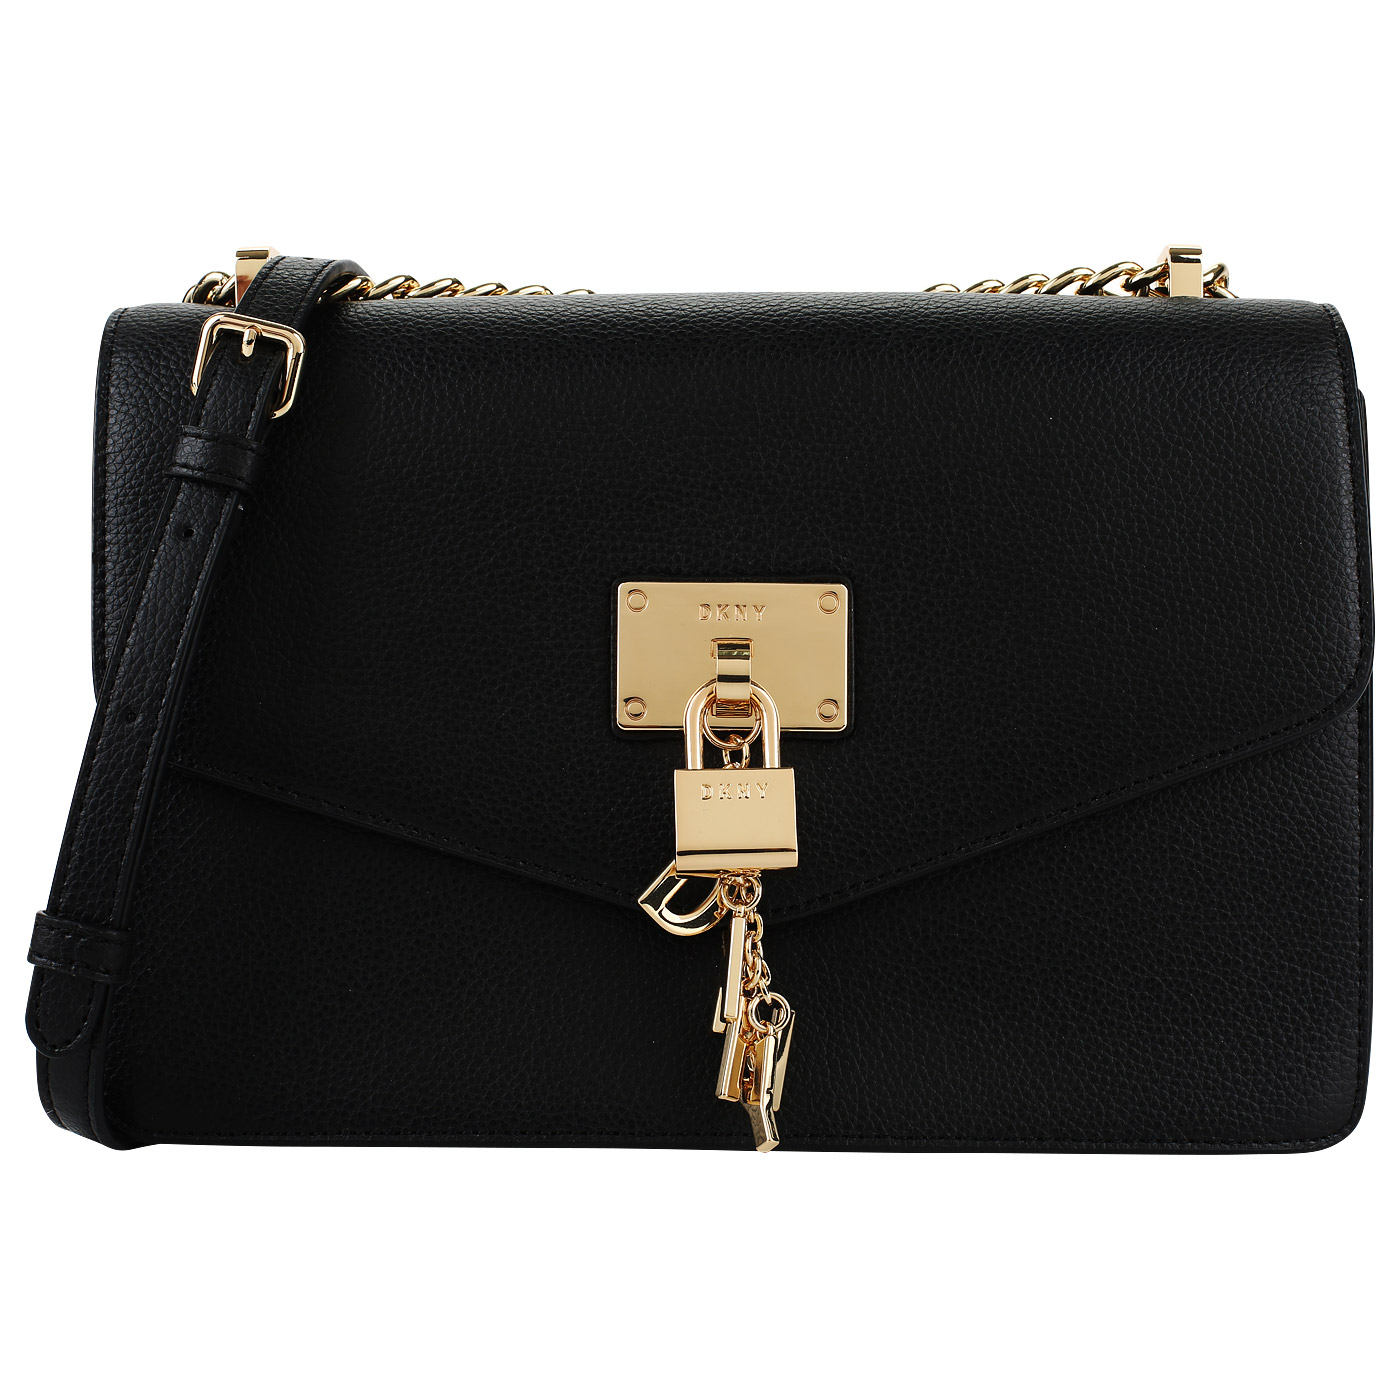 e5127aac119a Черная кожаная сумка на кнопке DKNY Elissa R813H281-001 ...